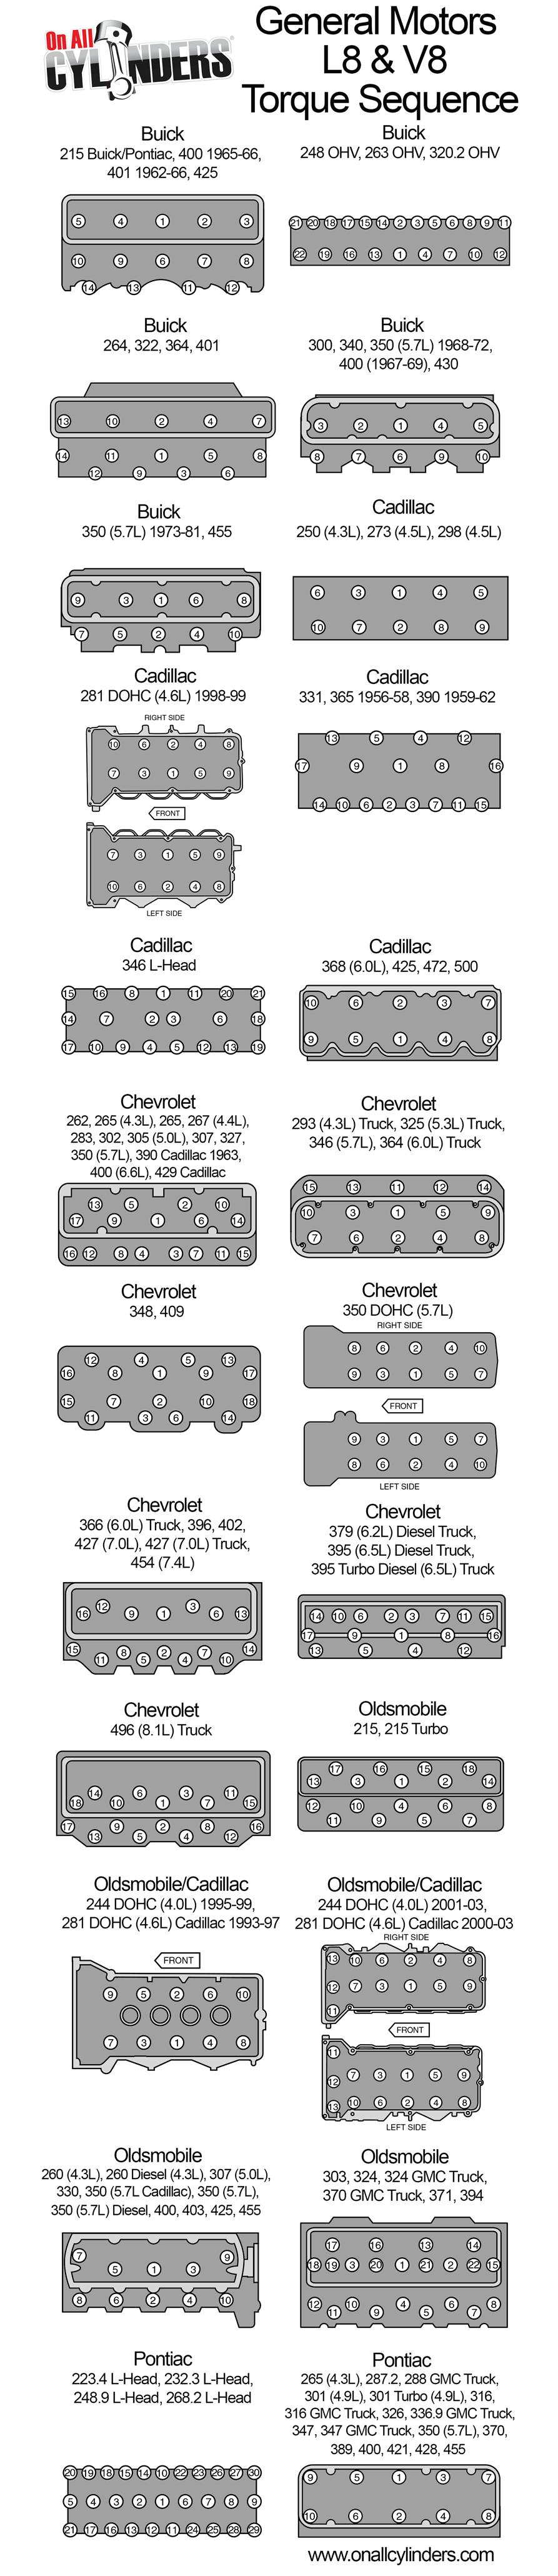 Diagram Diagram Of 1998 Mitsubishi Montero Fuse Box Full Version Hd Quality Fuse Box Ideaschematic2g Angelux It